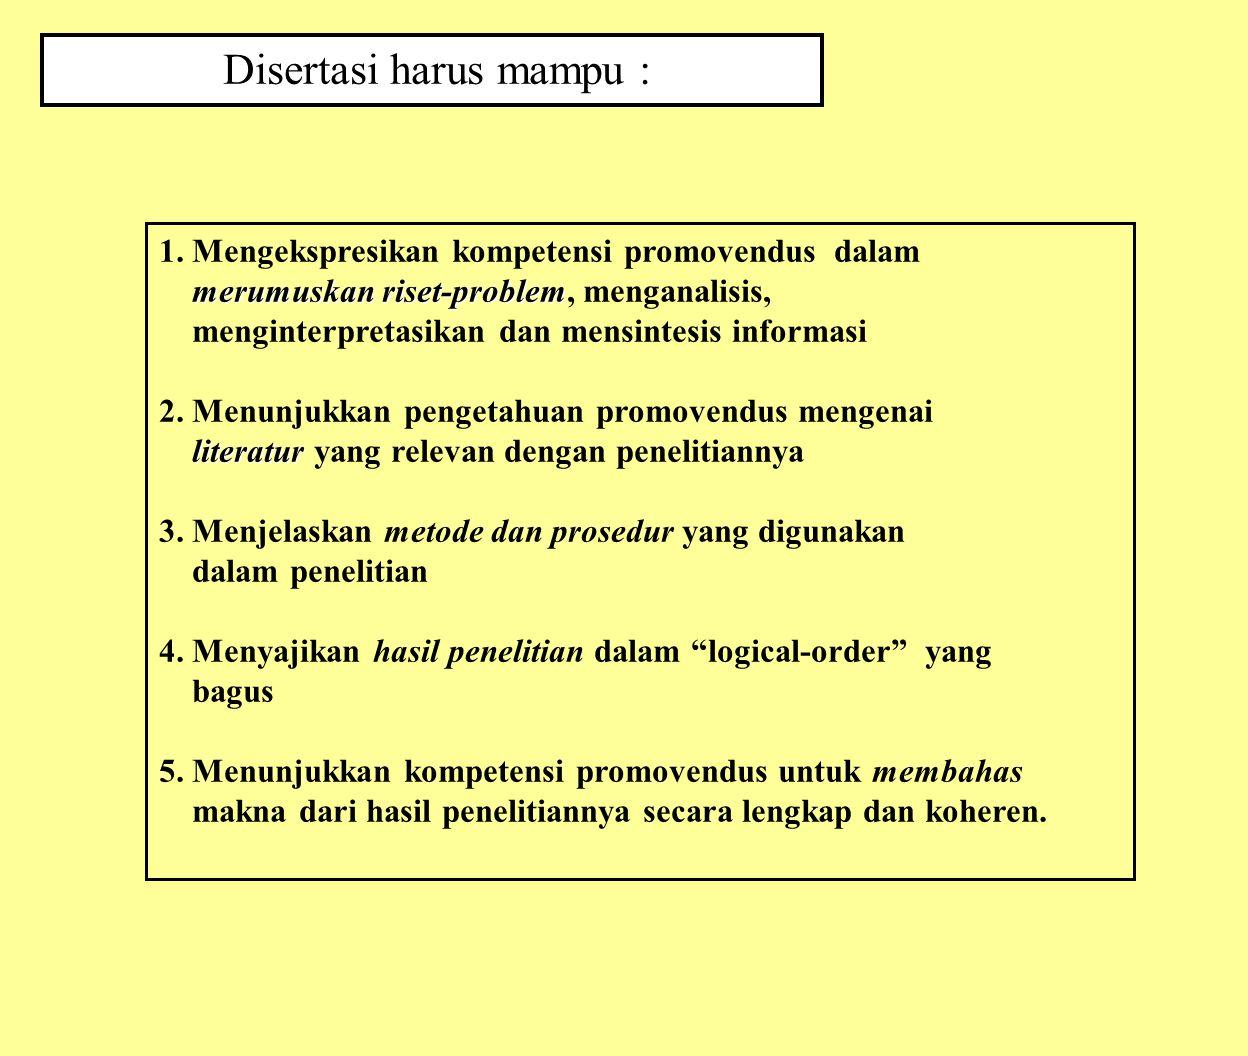 Disertasi harus mampu :